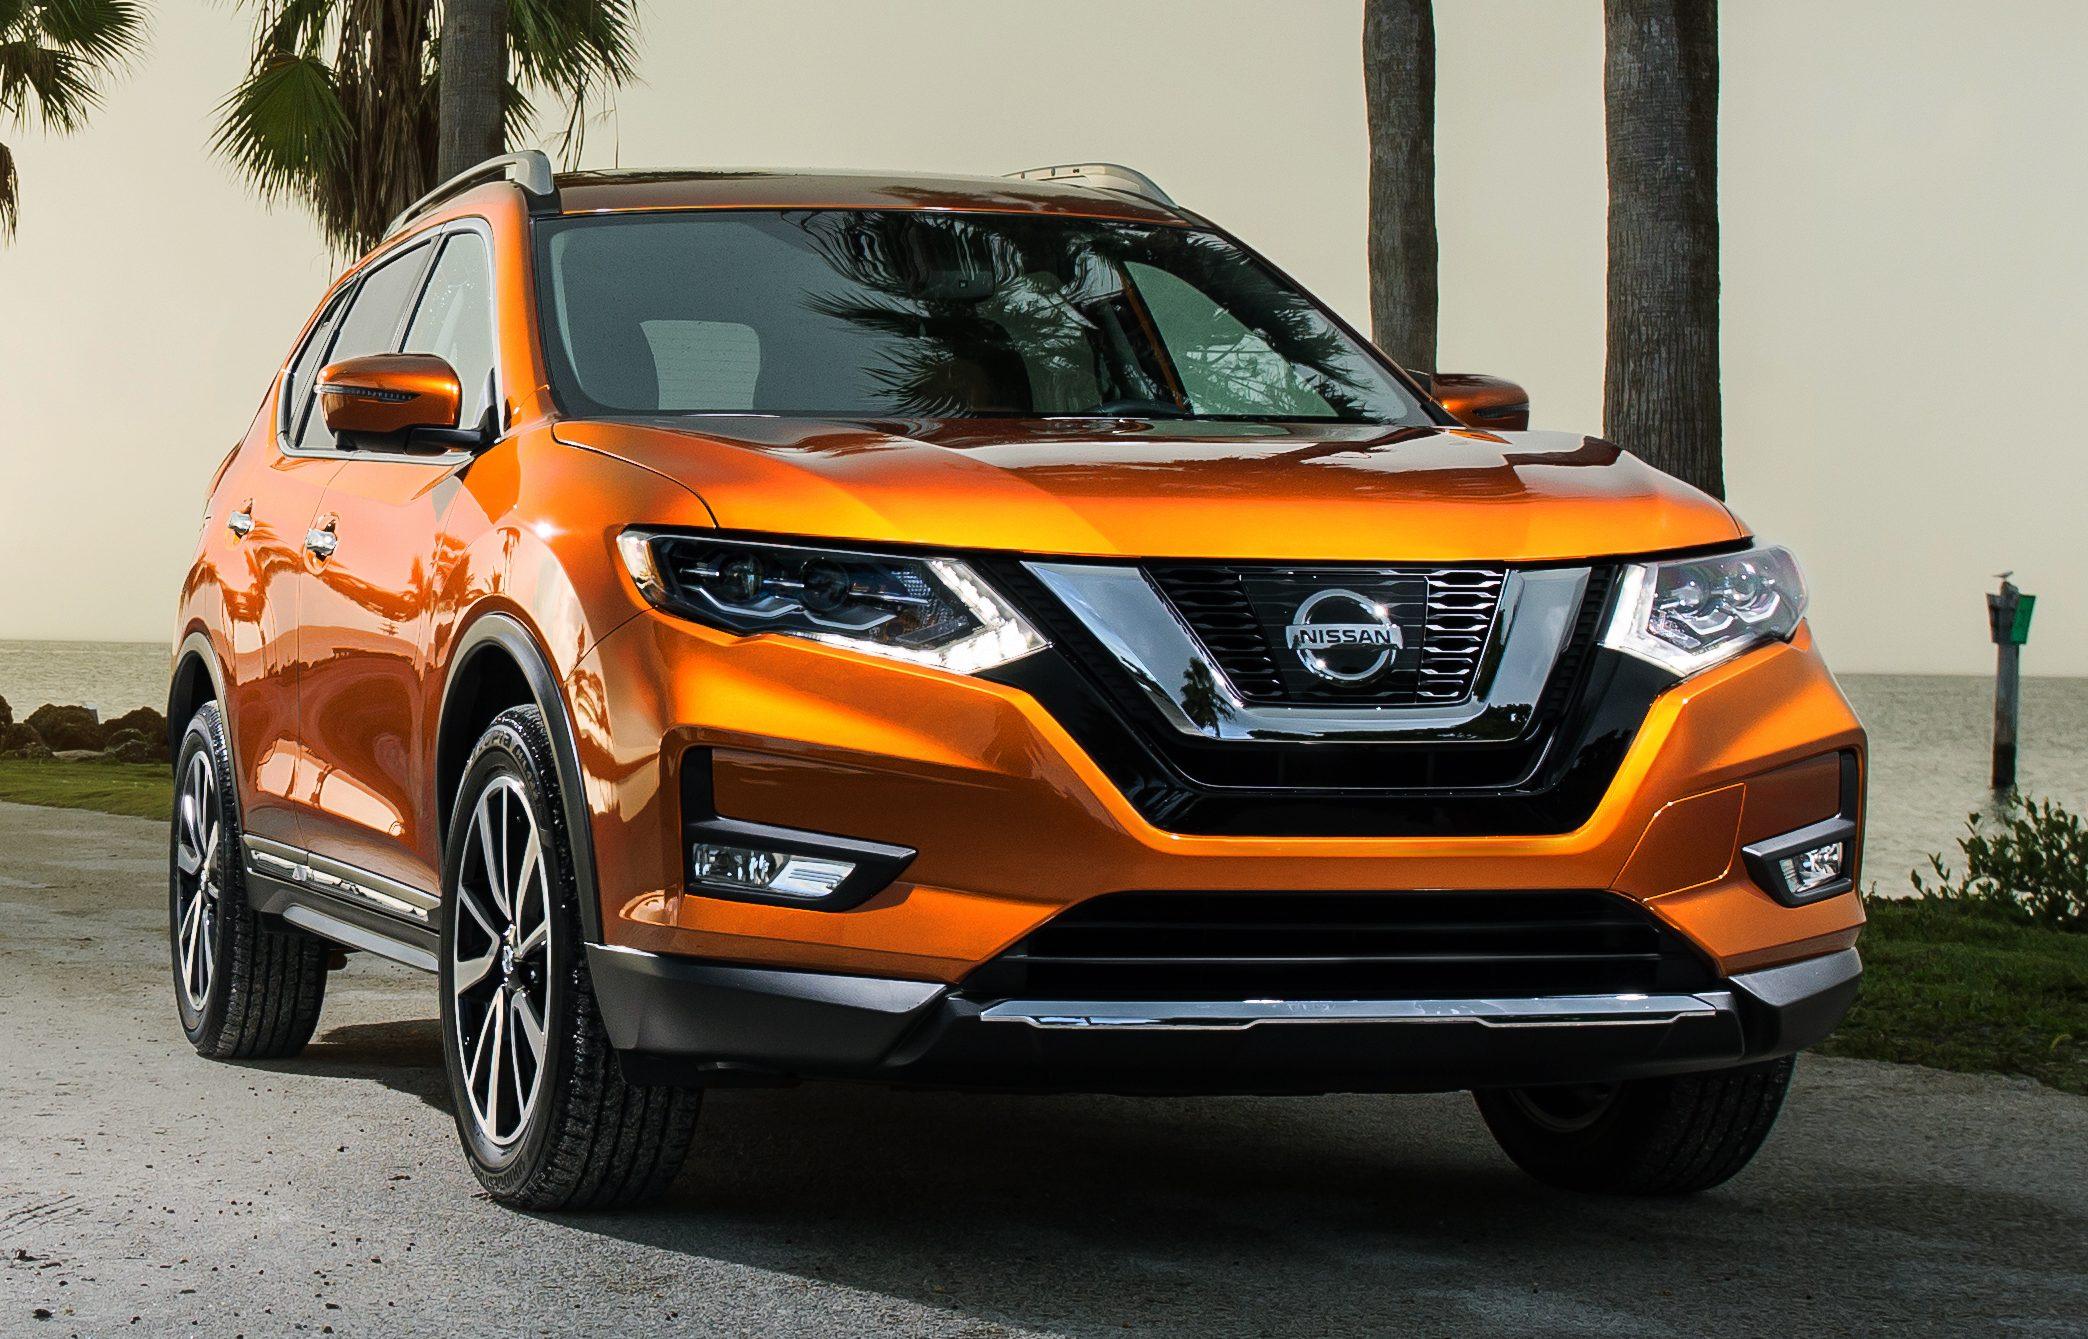 Lifted >> 北美 Nissan Rogue 小改款面市,本地 X-Trail 会跟进吗? 2017 Nissan Rogue SL - Paul Tan 汽车资讯网